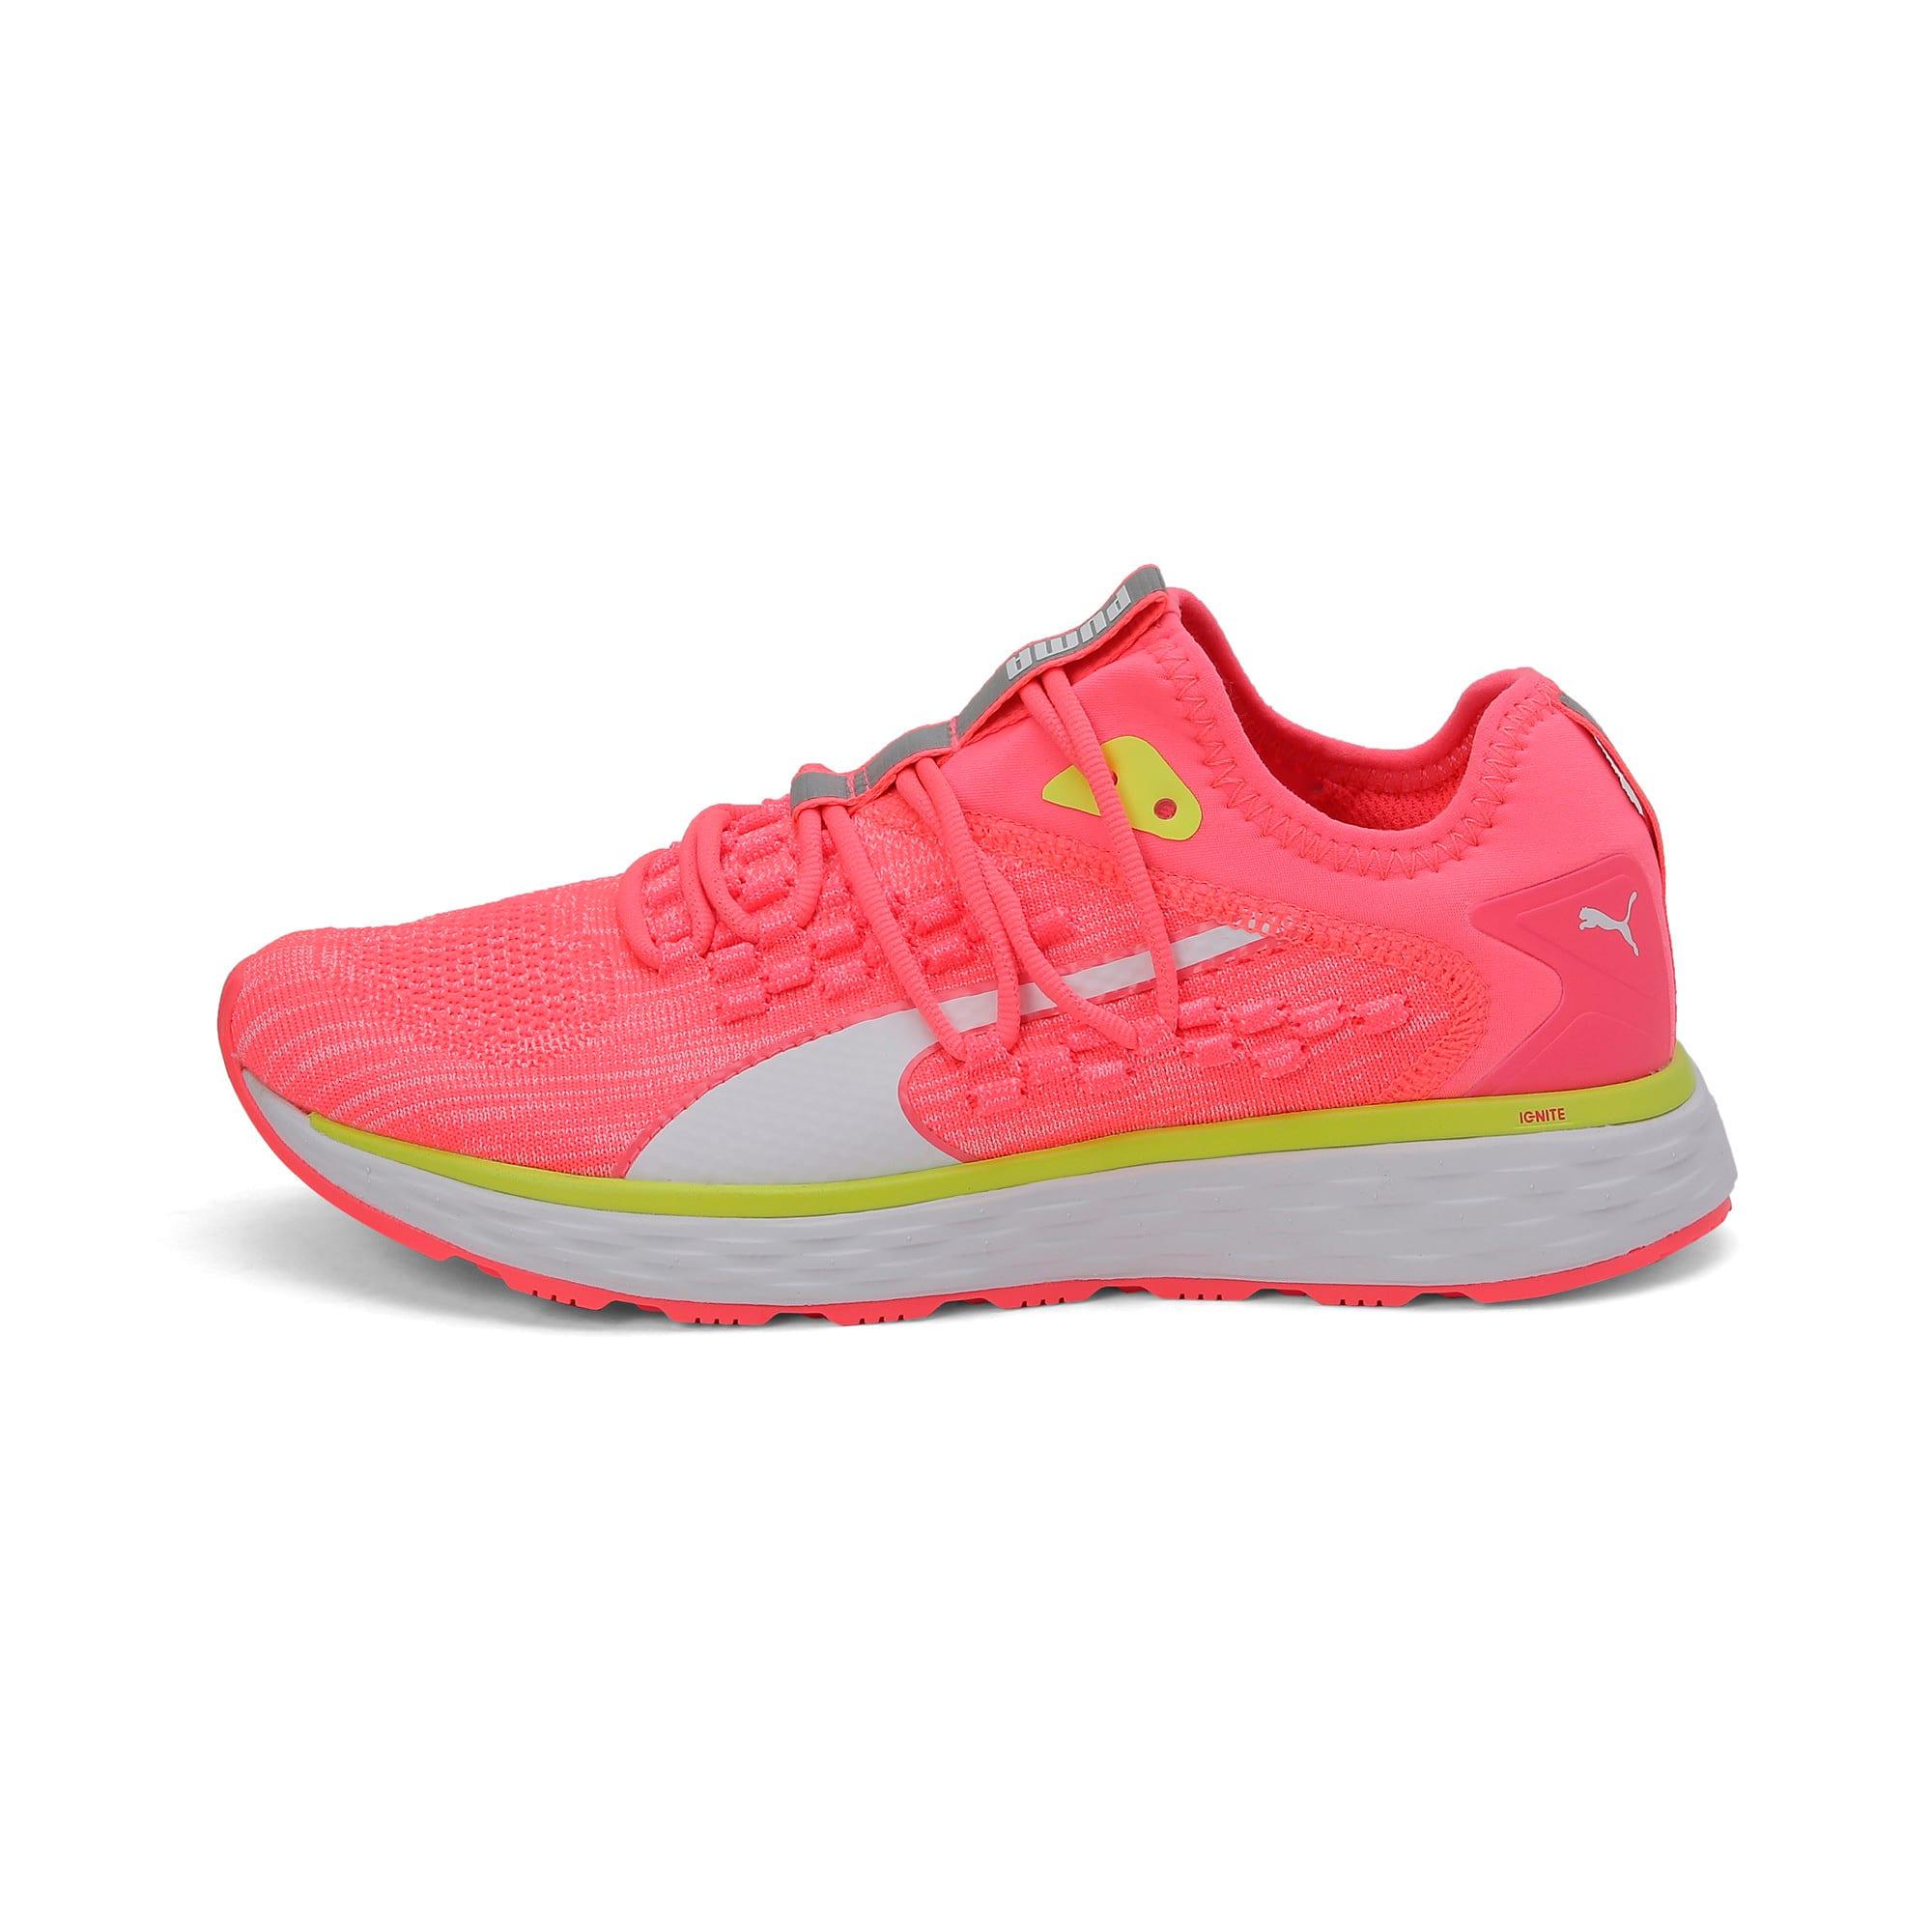 Thumbnail 1 of SPEED FUSEFIT Women's Running Shoes, Pink Alert-Puma White, medium-IND